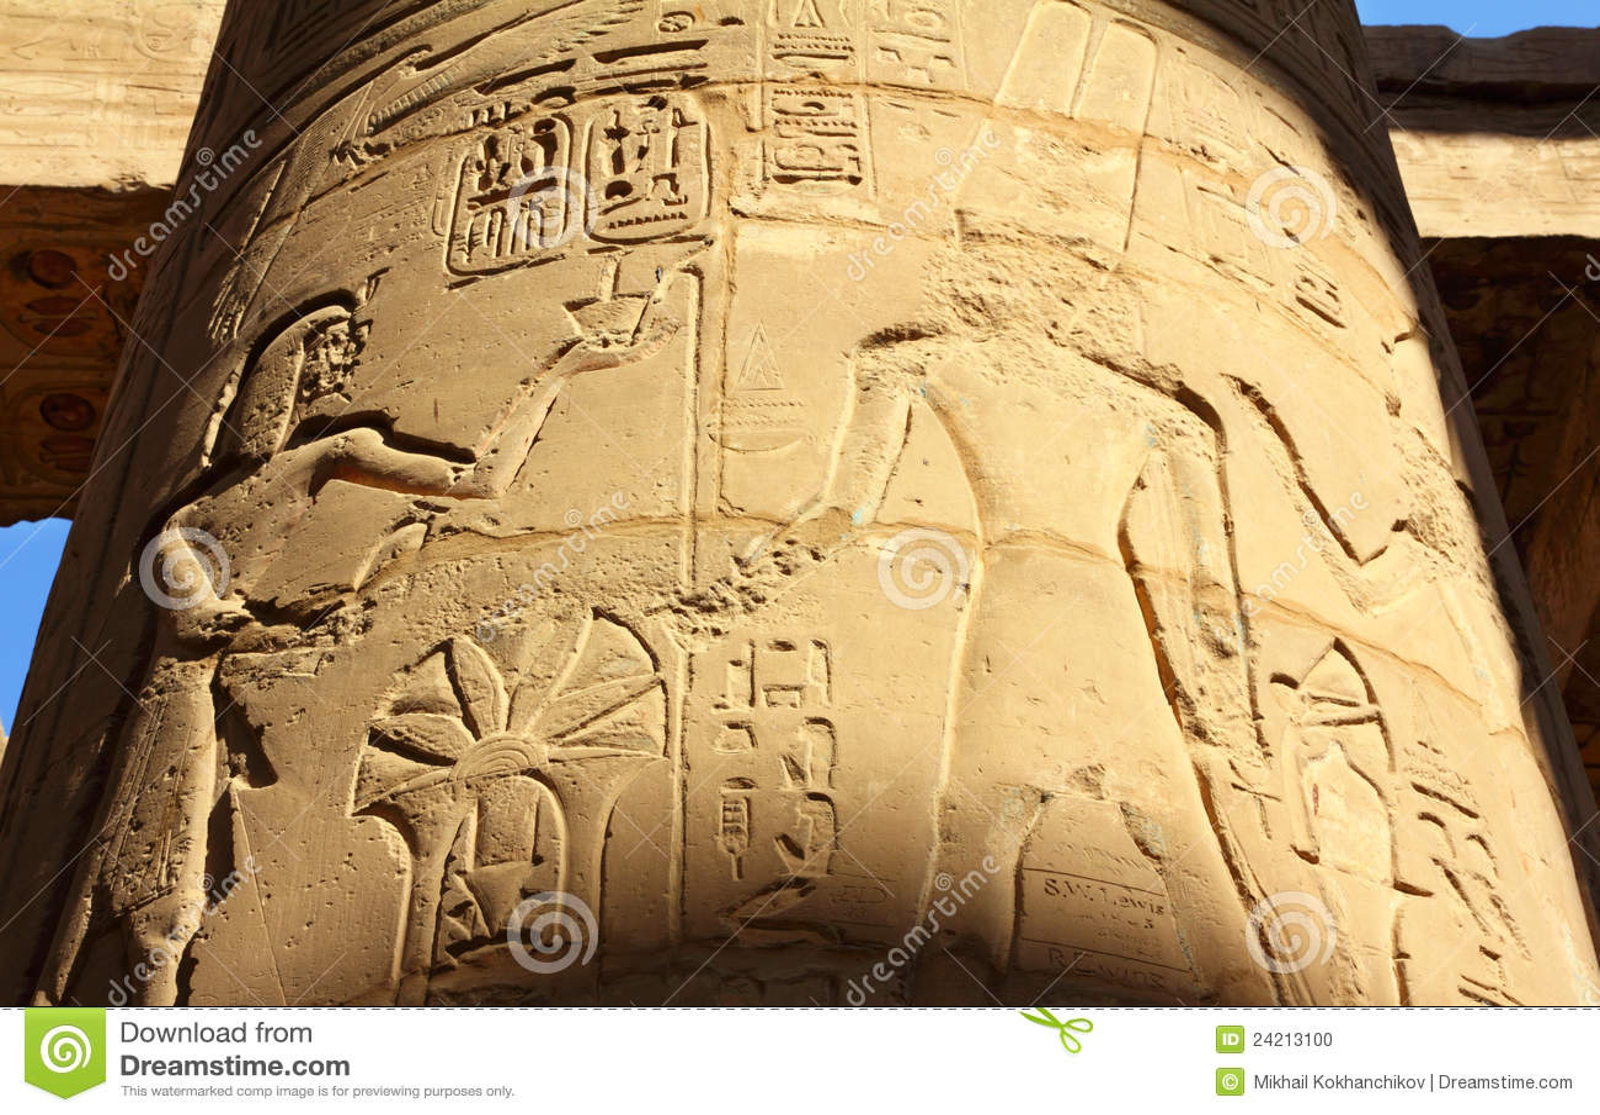 ... Egyptian Hieroglyphics Alphabet Translator Column with ancient egypt